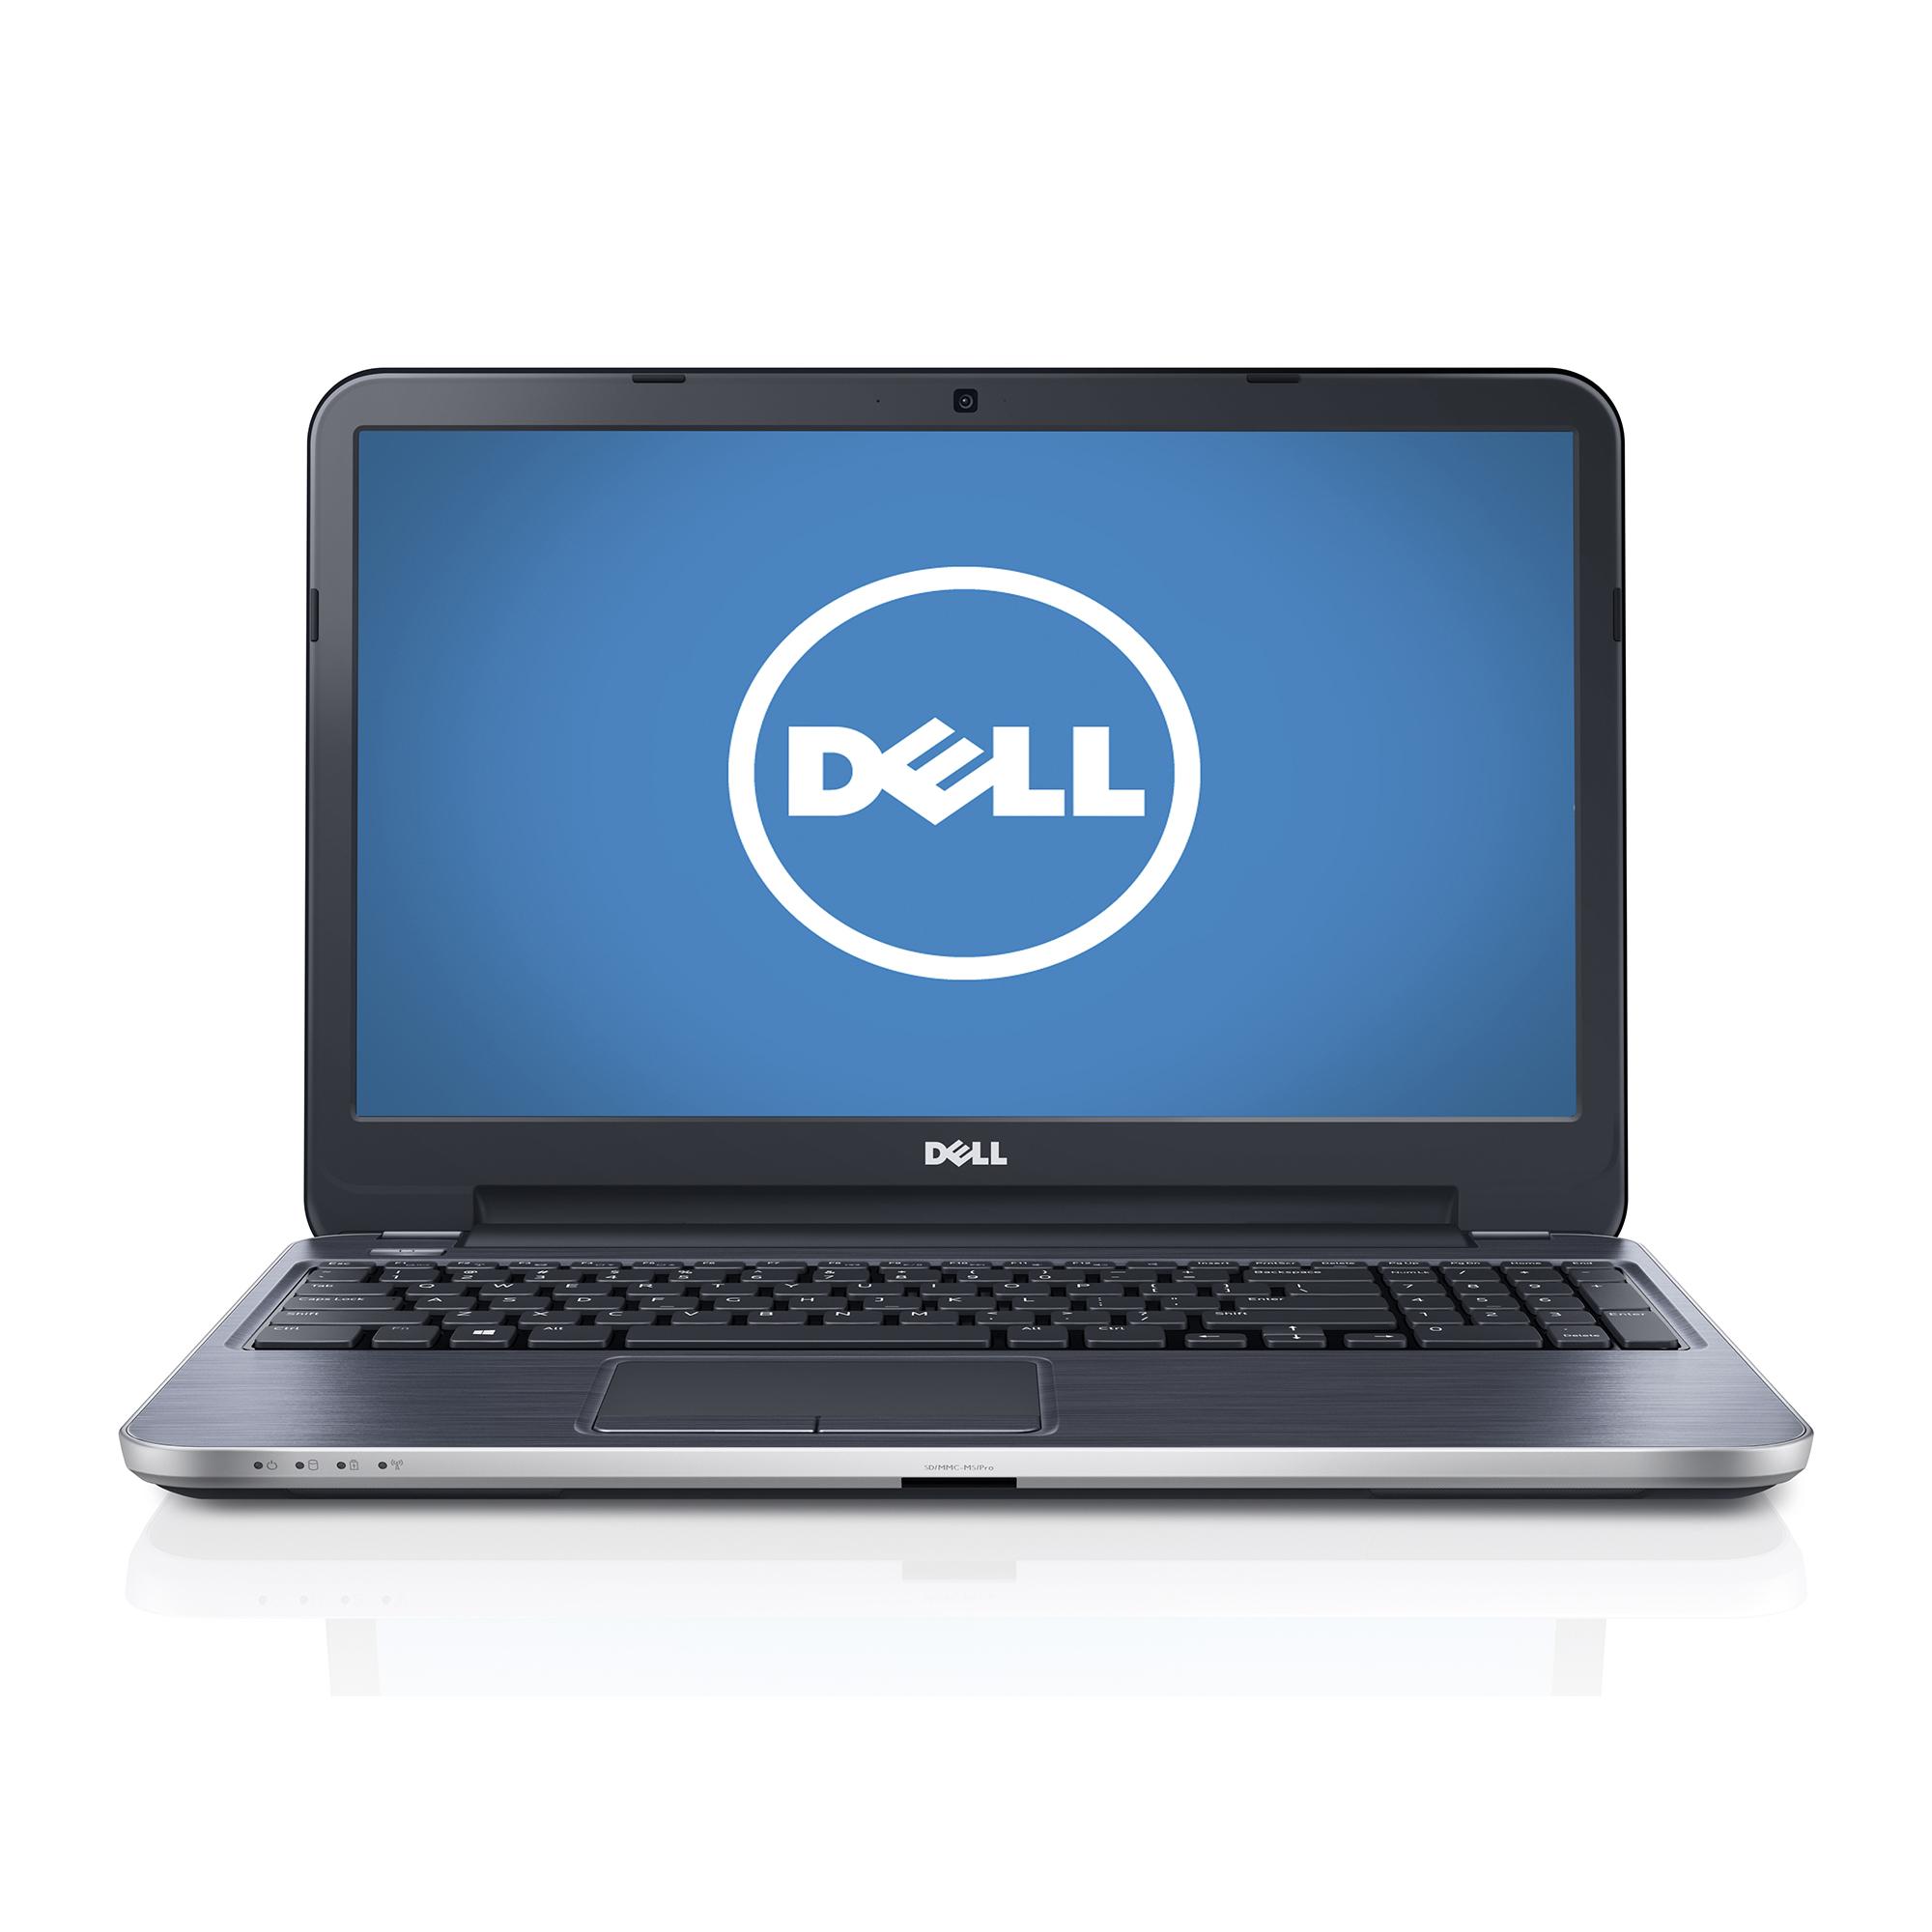 Dell Inspiron M531R Laptop 15 6 Screen AMD A10 8GB Memory 1TB Hard Drive Windows 8 by fice Depot & ficeMax